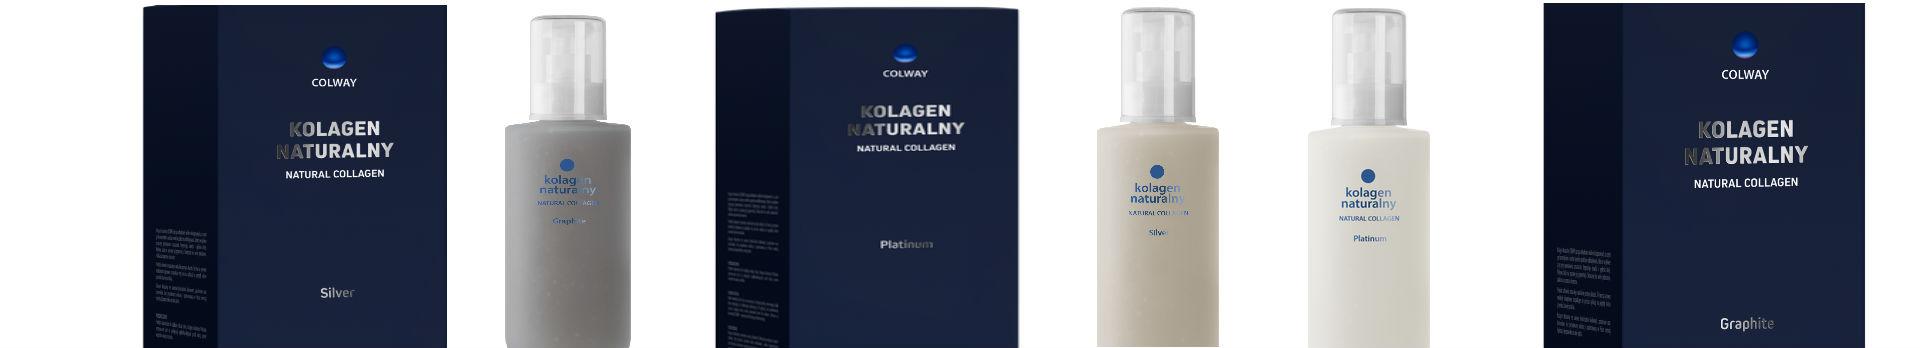 Kolagen Naturalny Colway kategoria